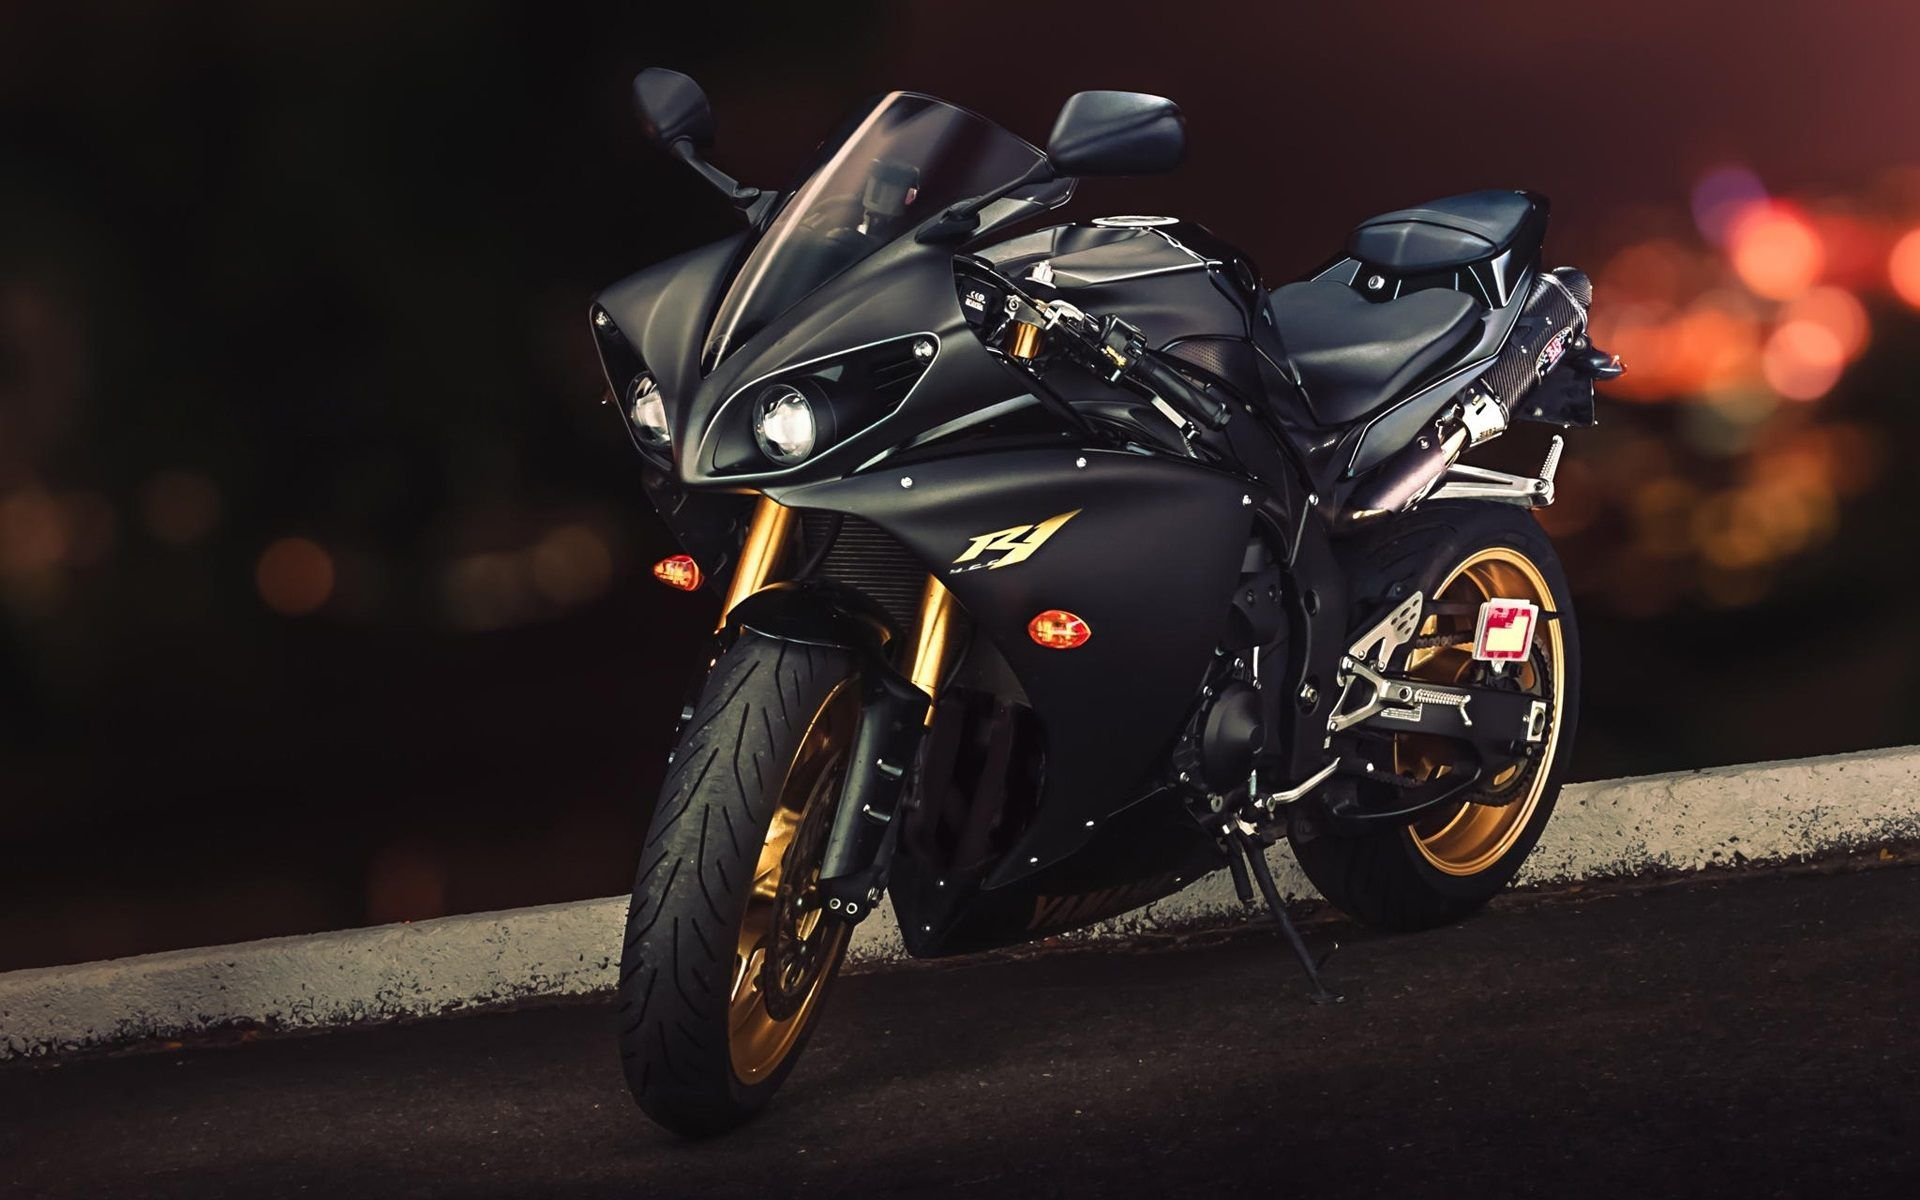 yamaha r1 motorcycle wallpaper hd download for desktop | epic car